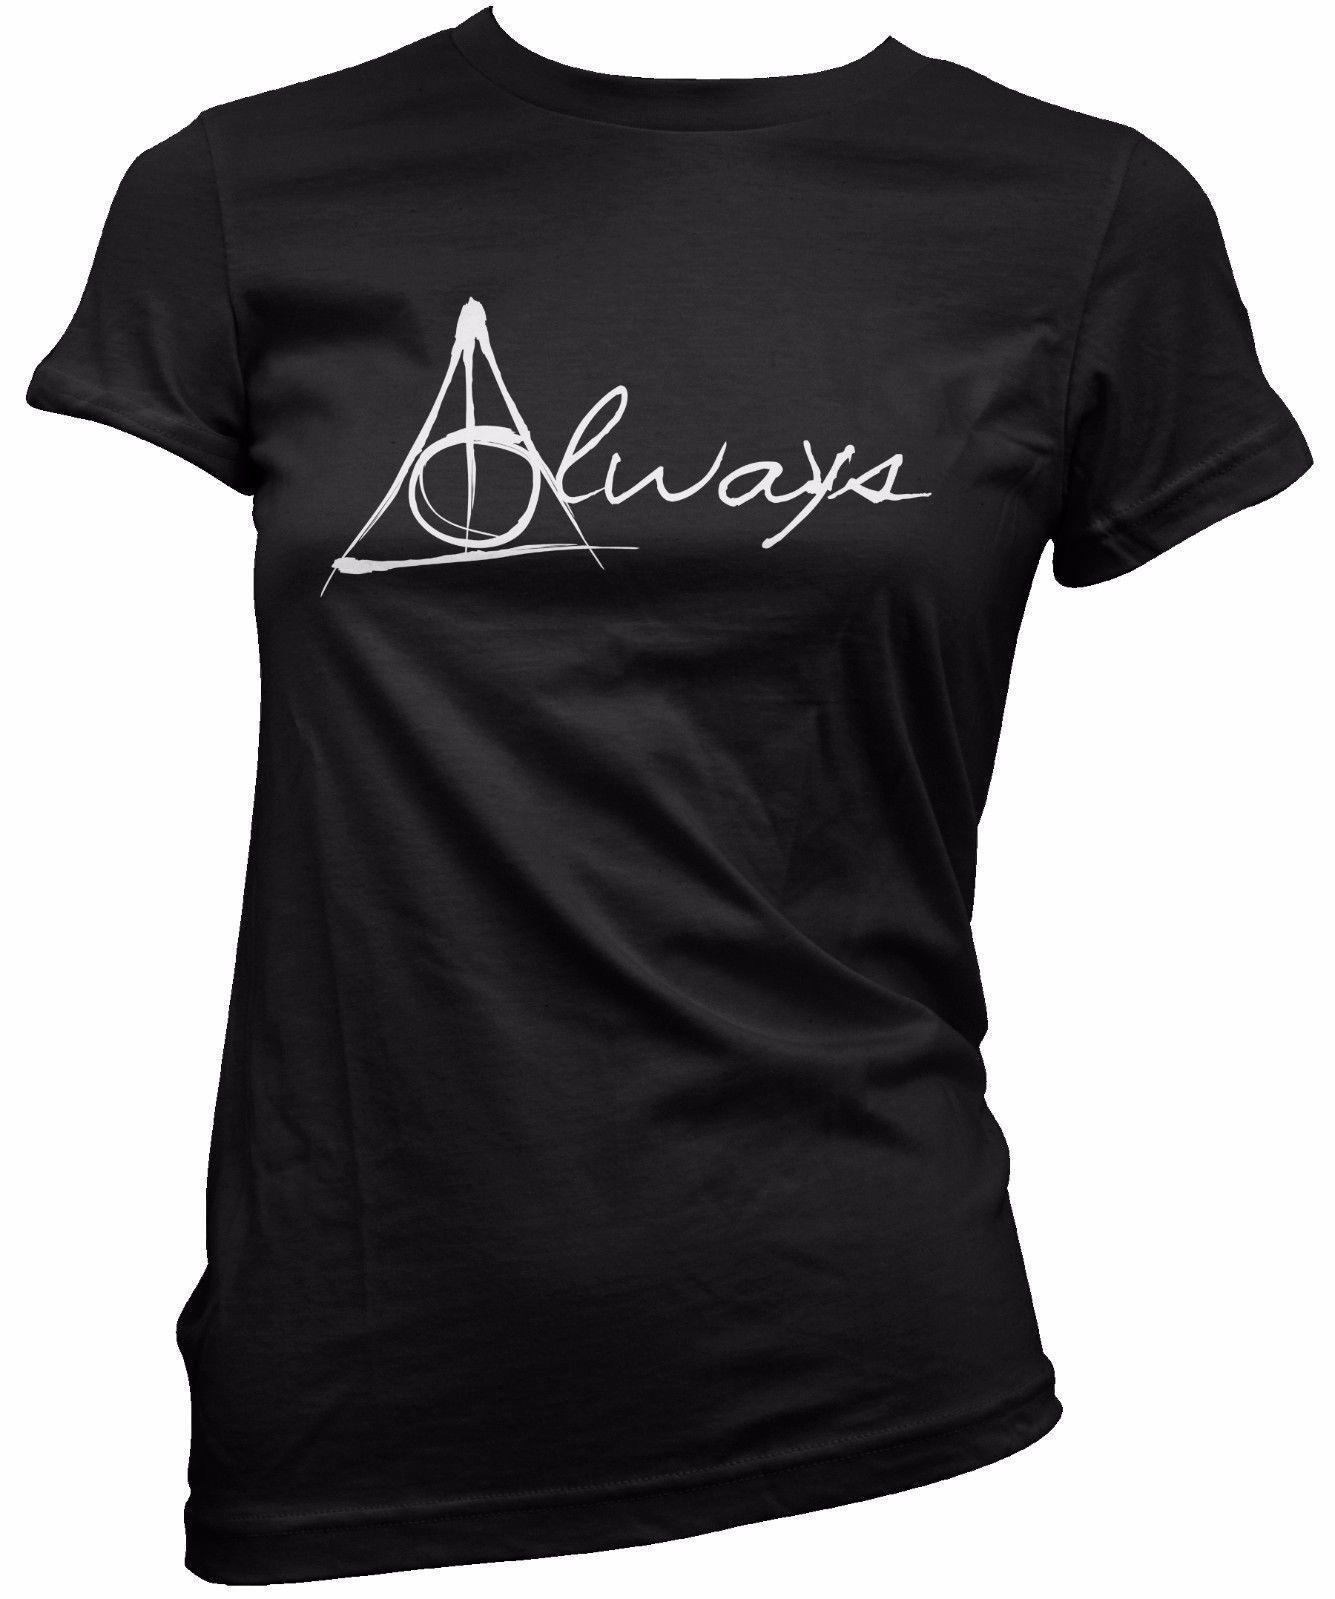 c60f02238b27 T-shirt Donna